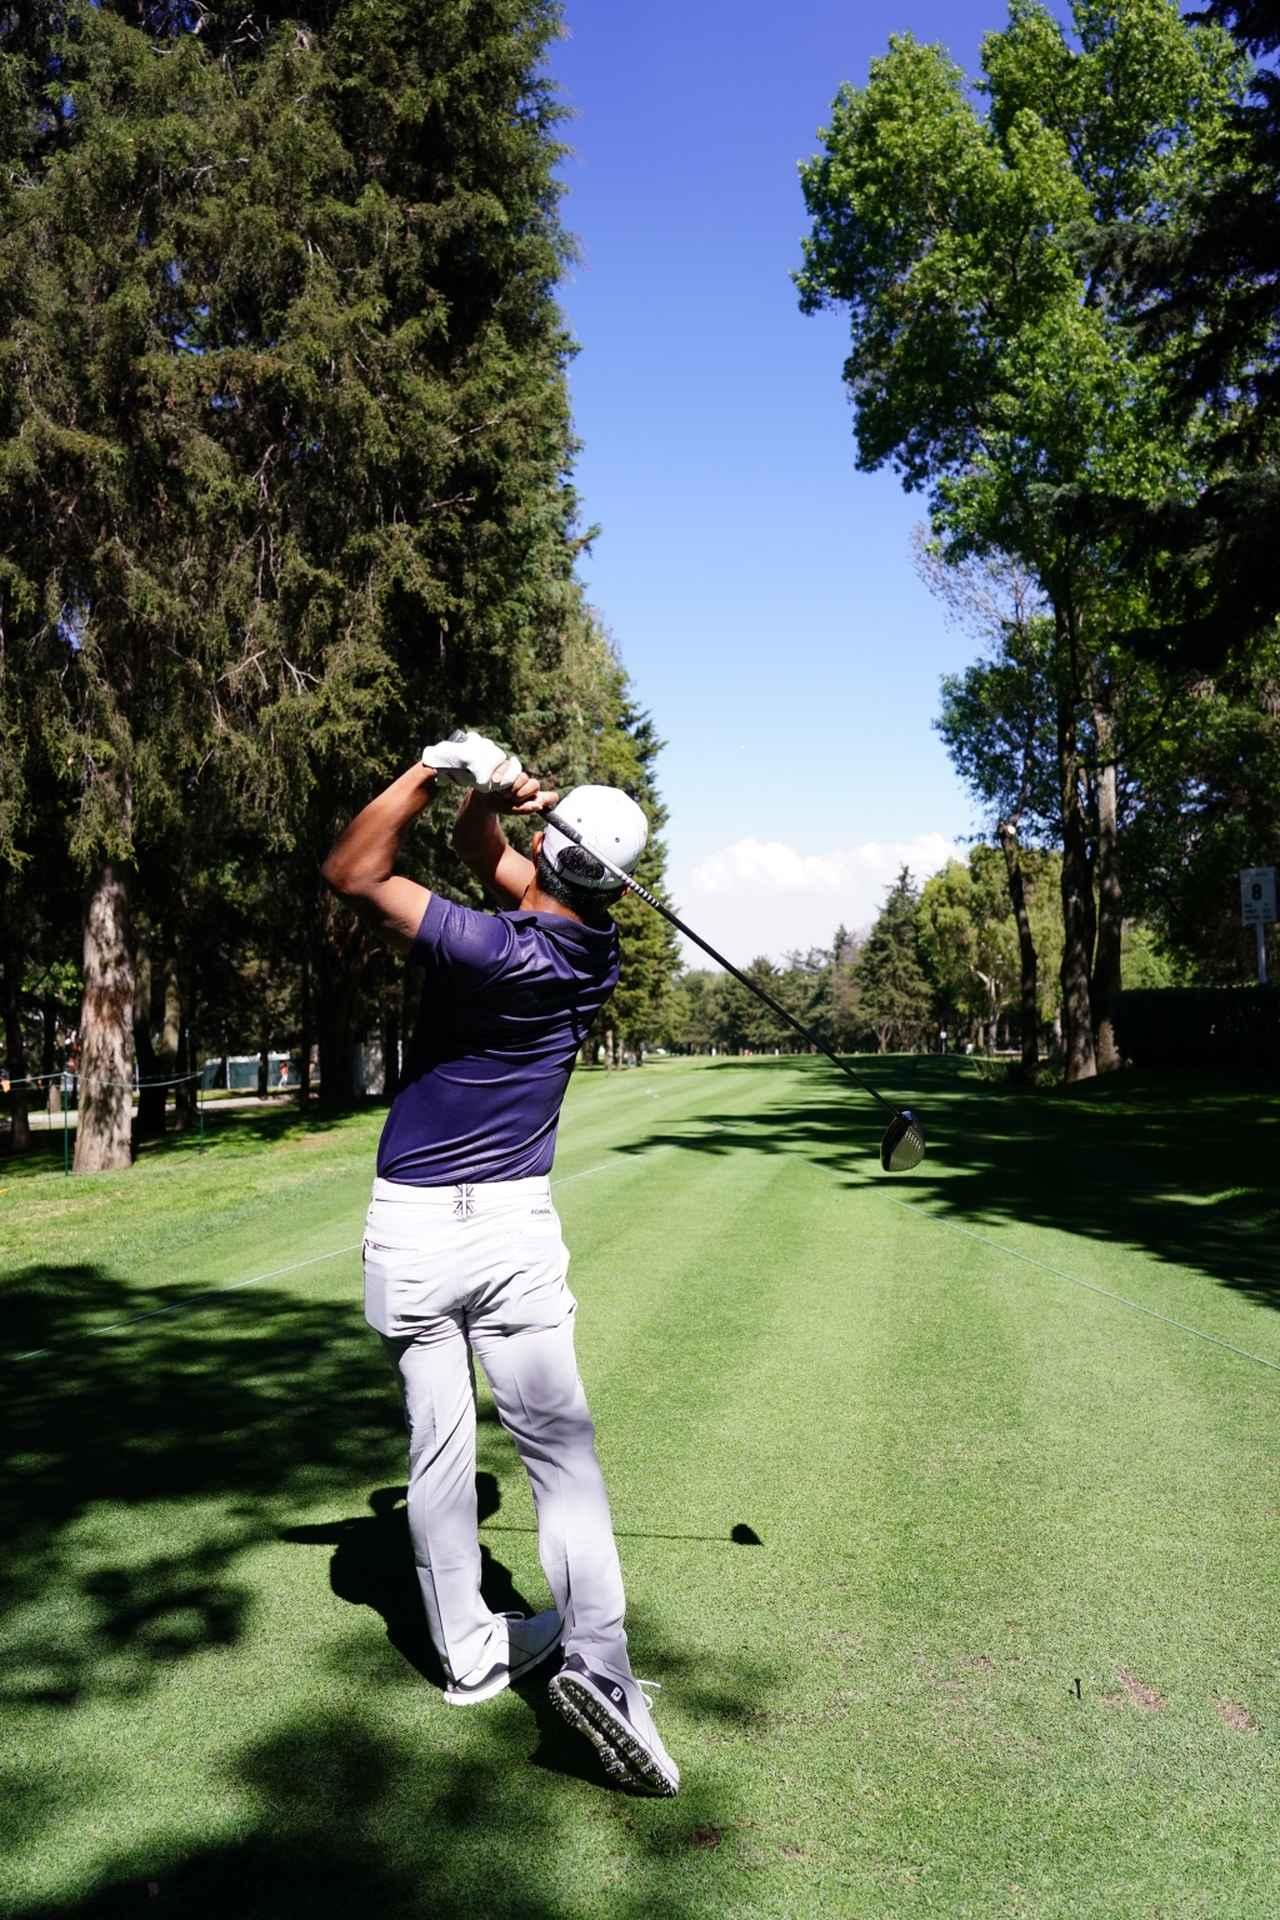 Images : 14番目の画像 - 小平智のドライバー連続写真 - みんなのゴルフダイジェスト